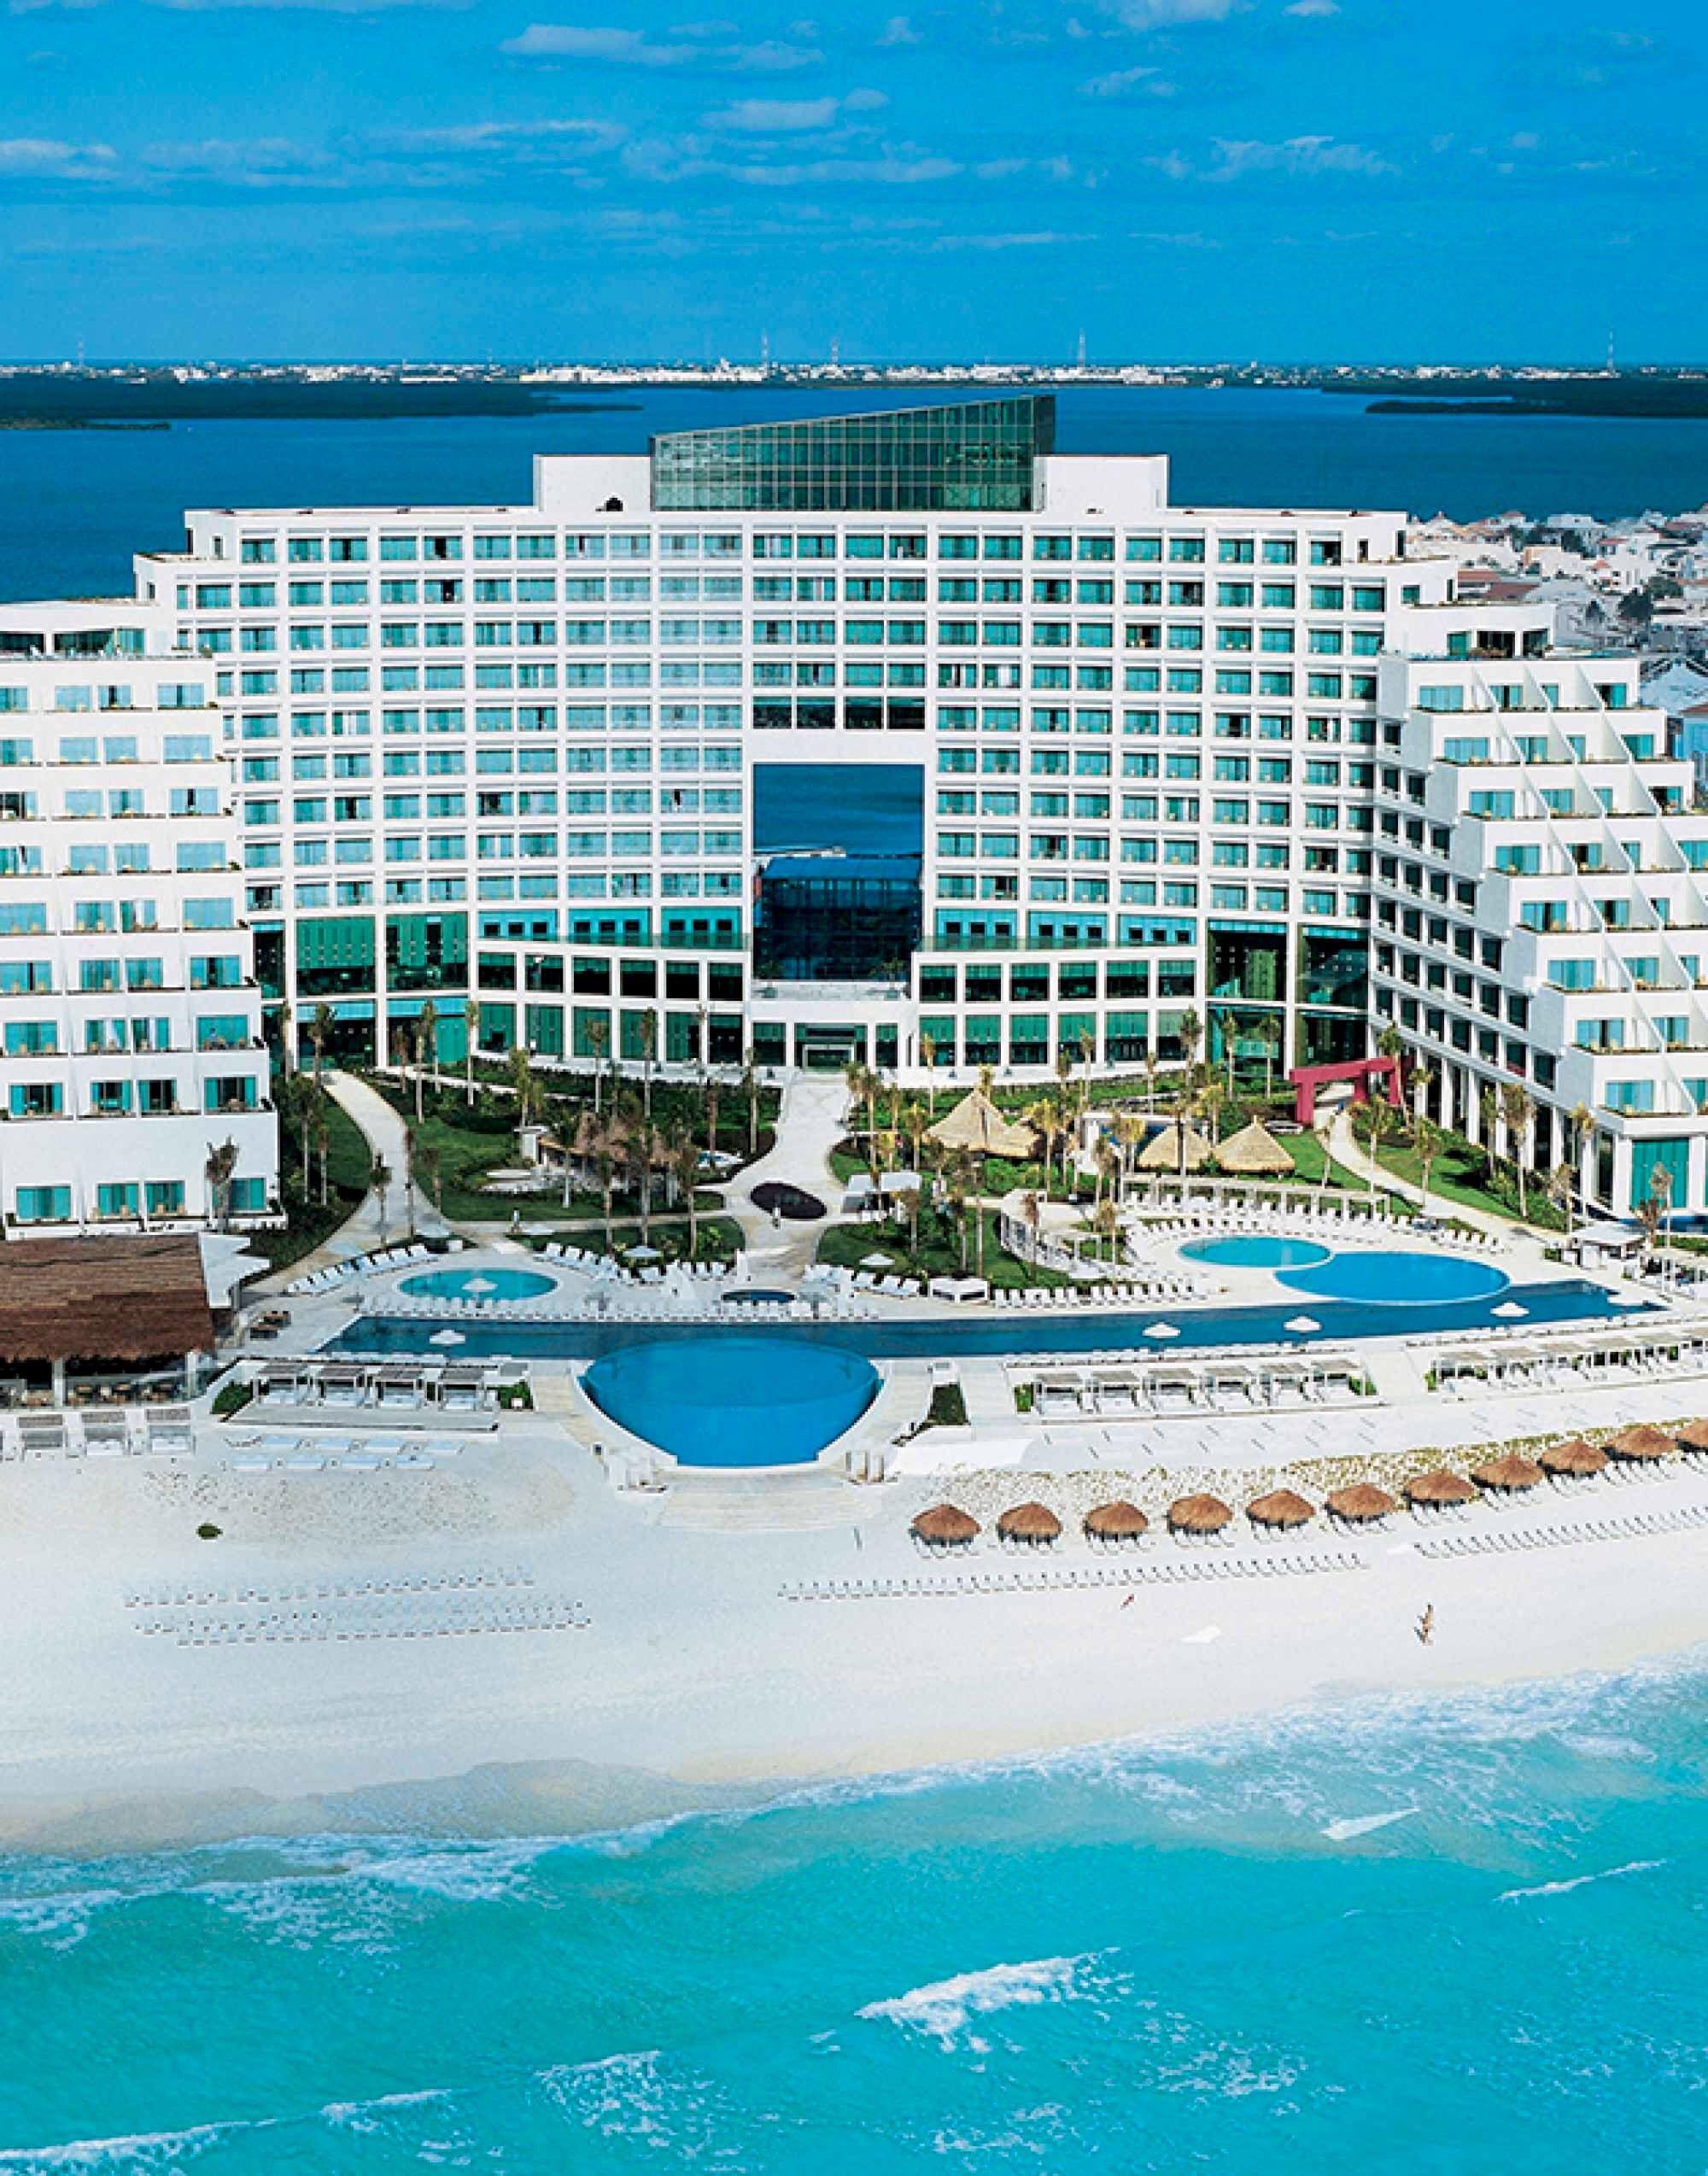 Live Aqua  Cancun Mexico  Live aqua cancun Live aqua